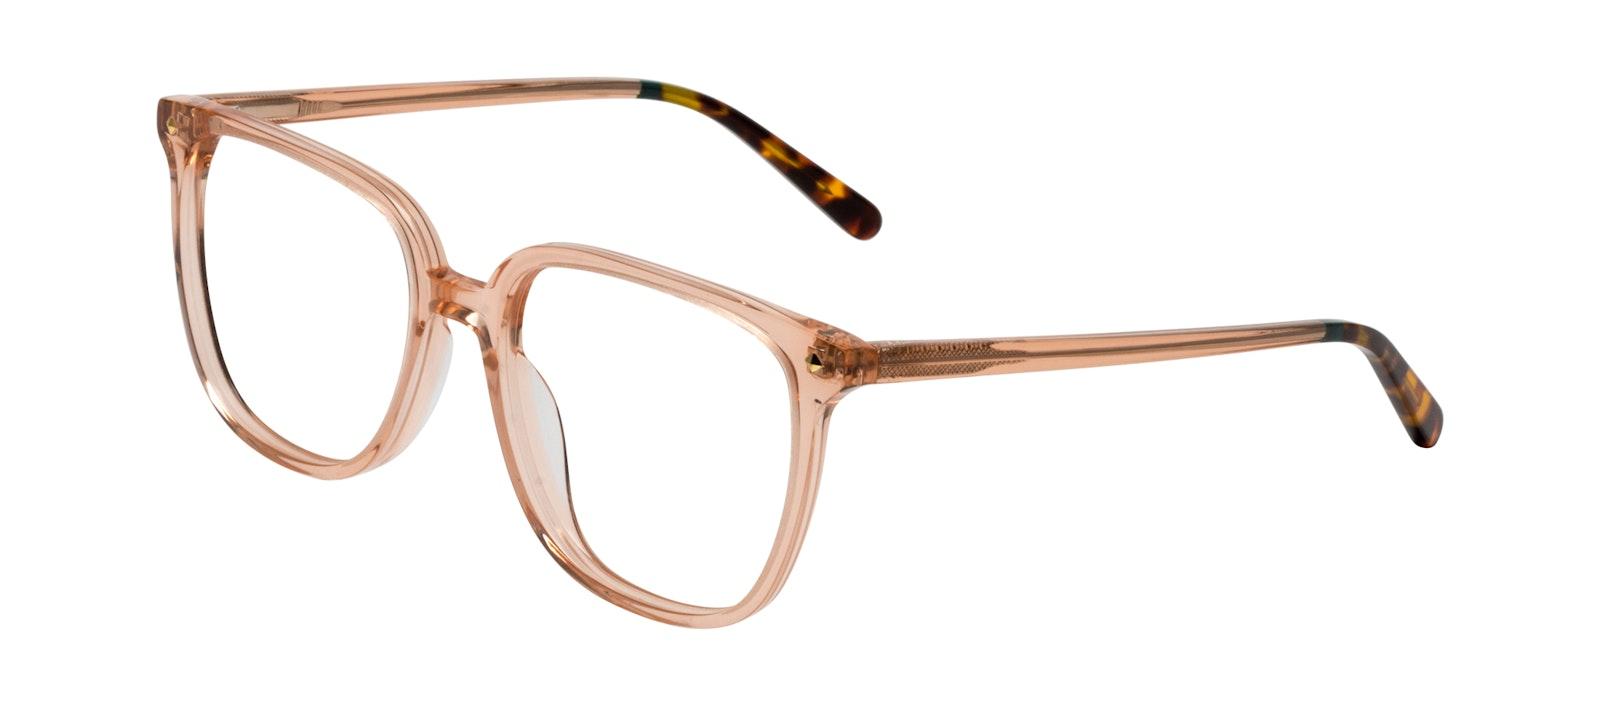 Affordable Fashion Glasses Eyeglasses Women Gia Peach Tilt